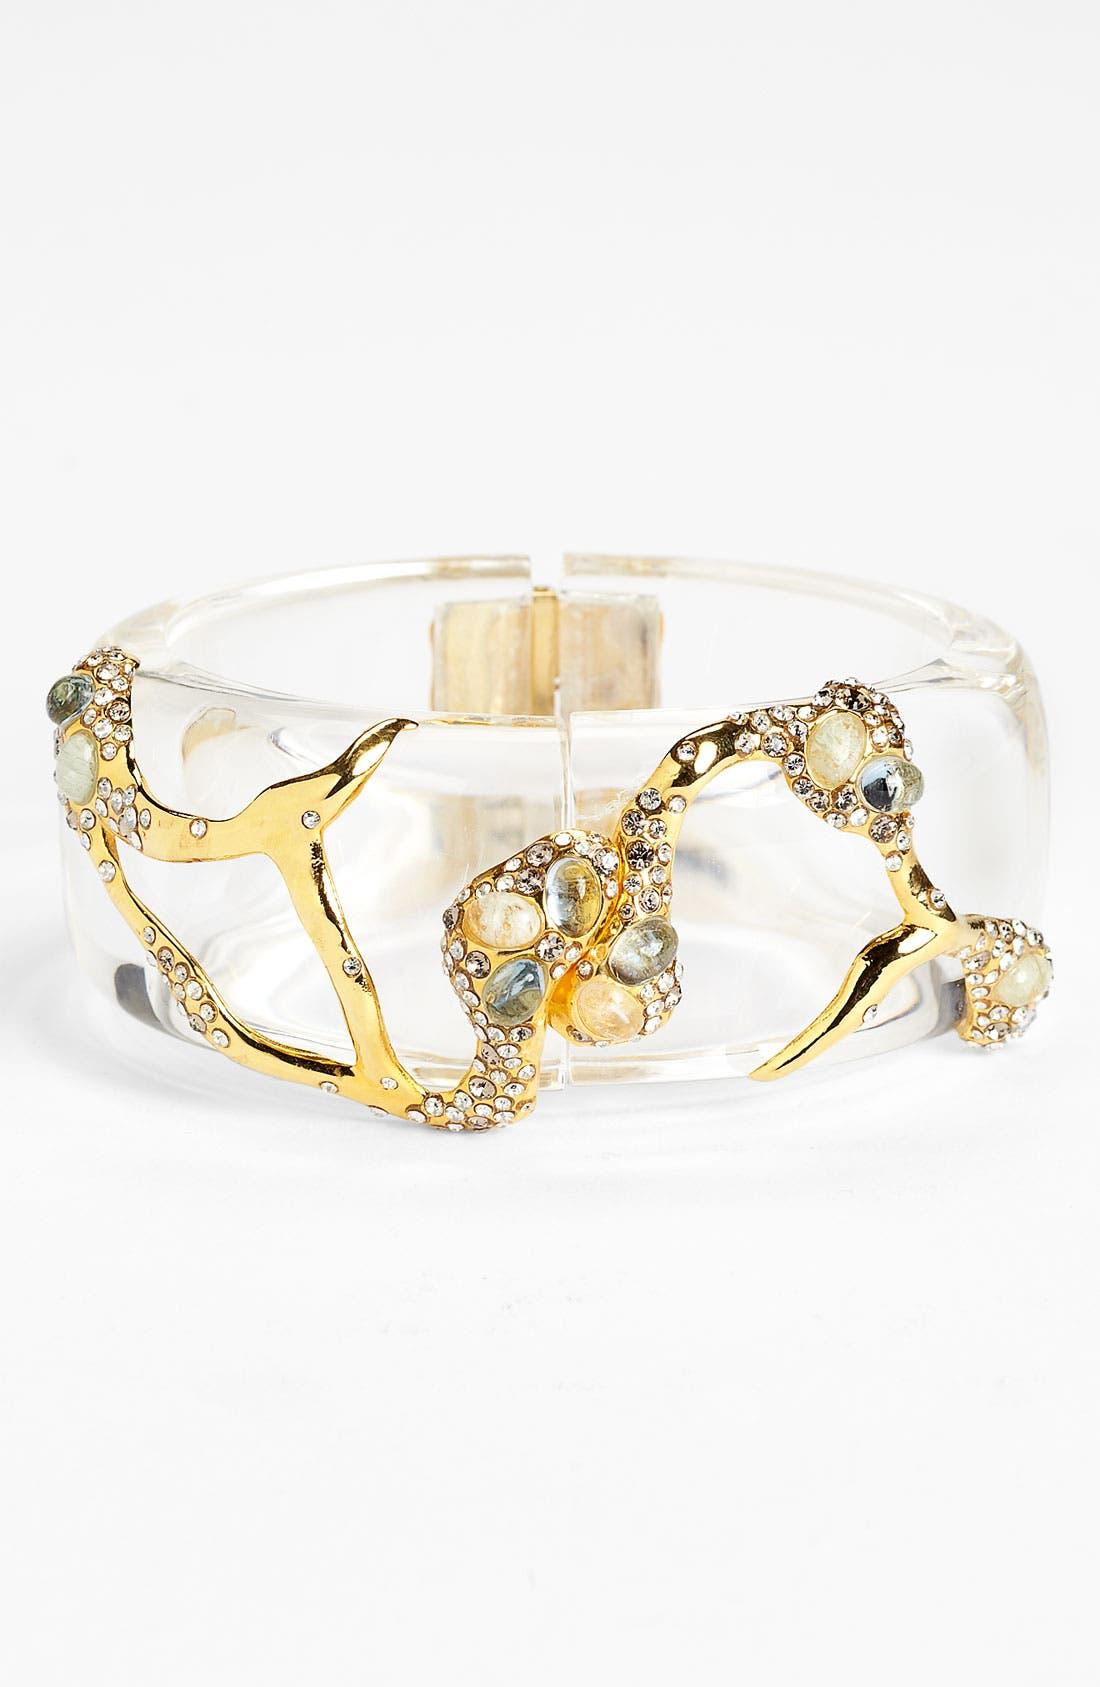 Main Image - Alexis Bittar 'Modernist - Embraced' Hinged Bracelet